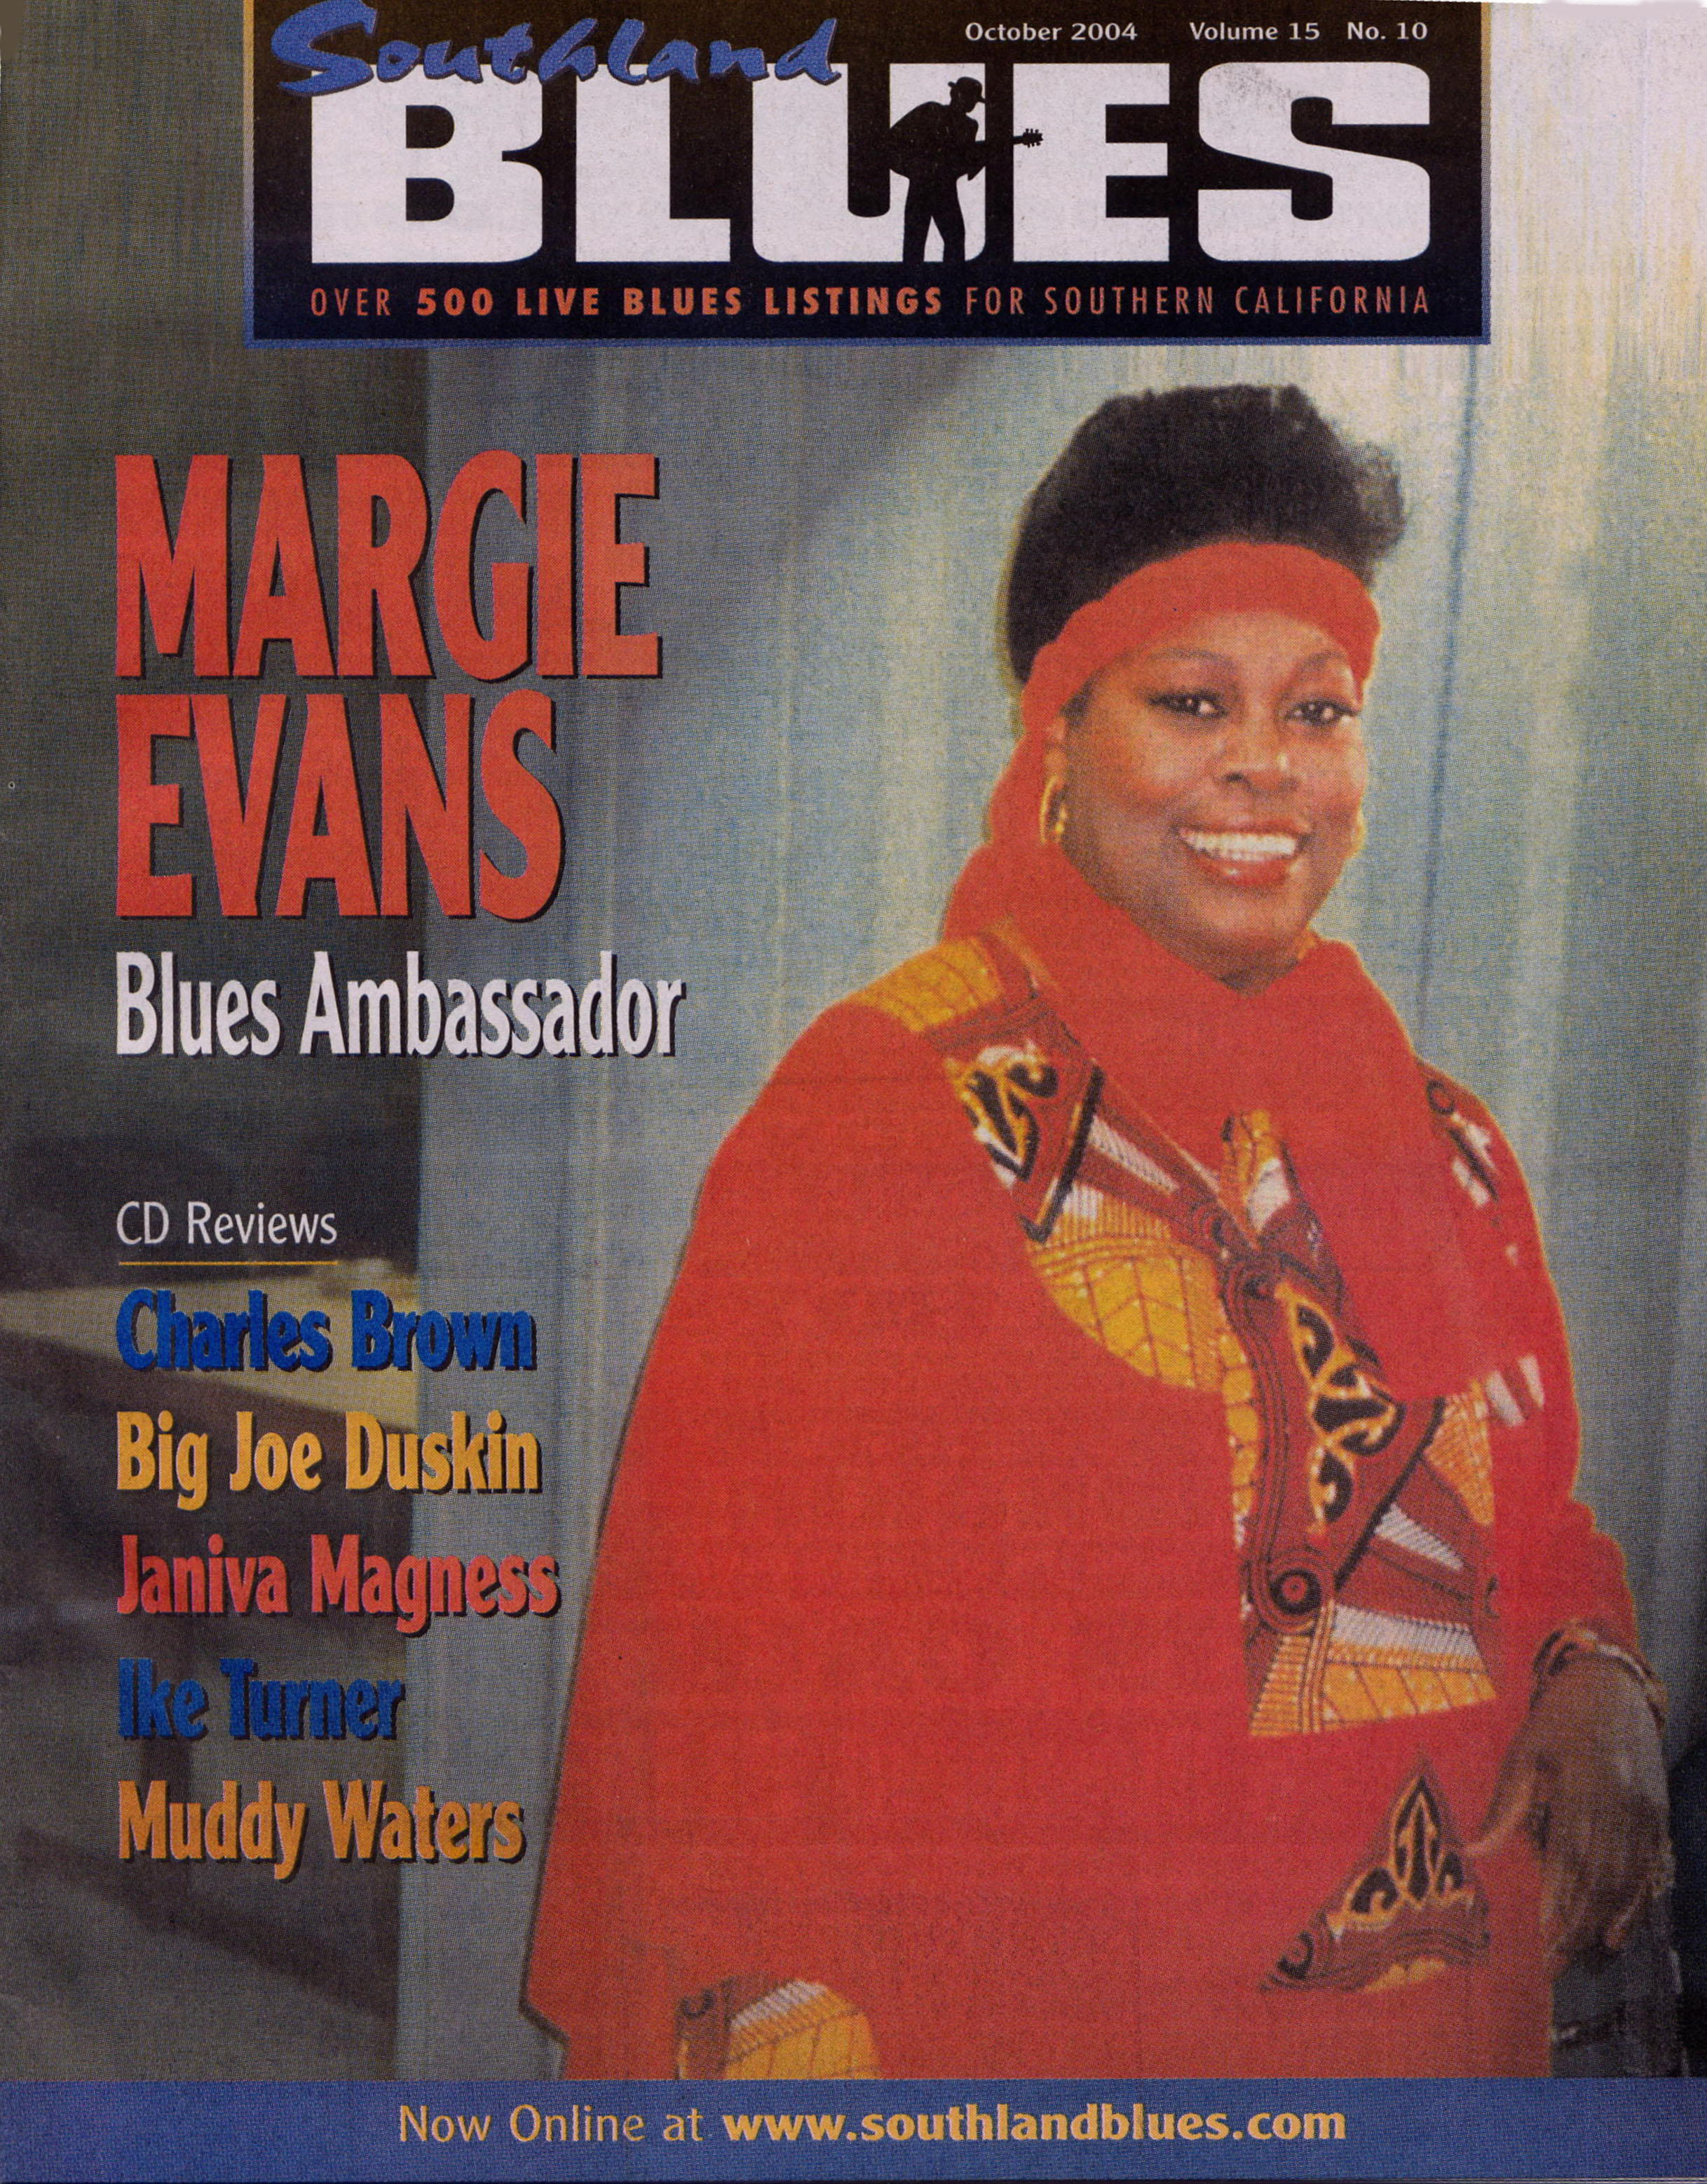 Margie Evans, Ambassador of the Blues